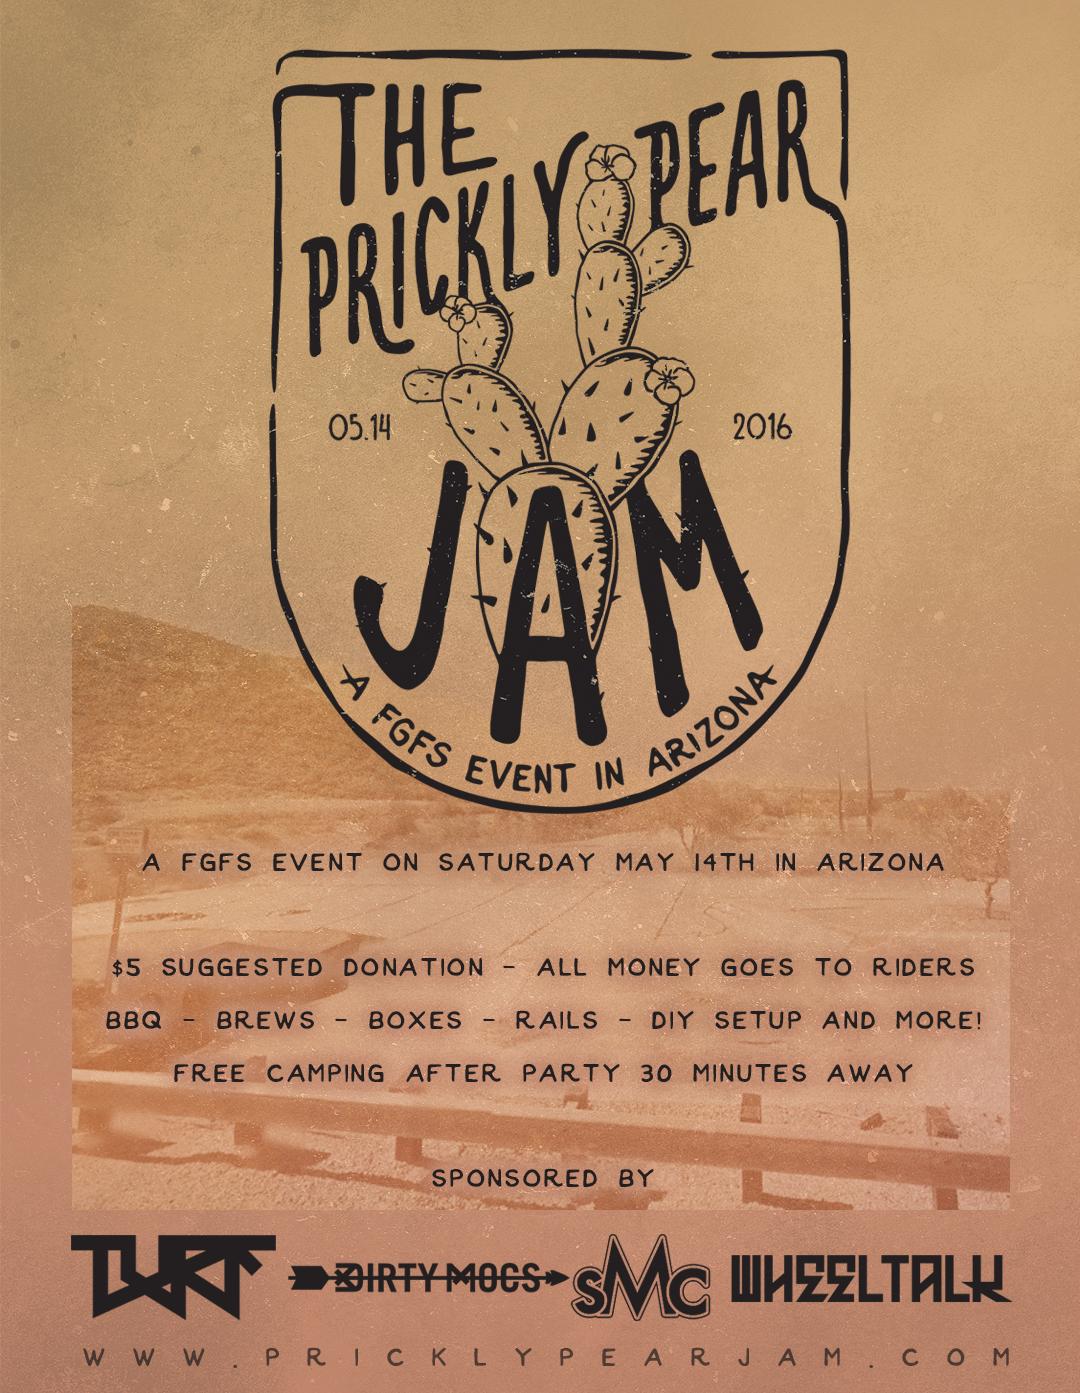 PricklyPearJam_Flyer3.jpg